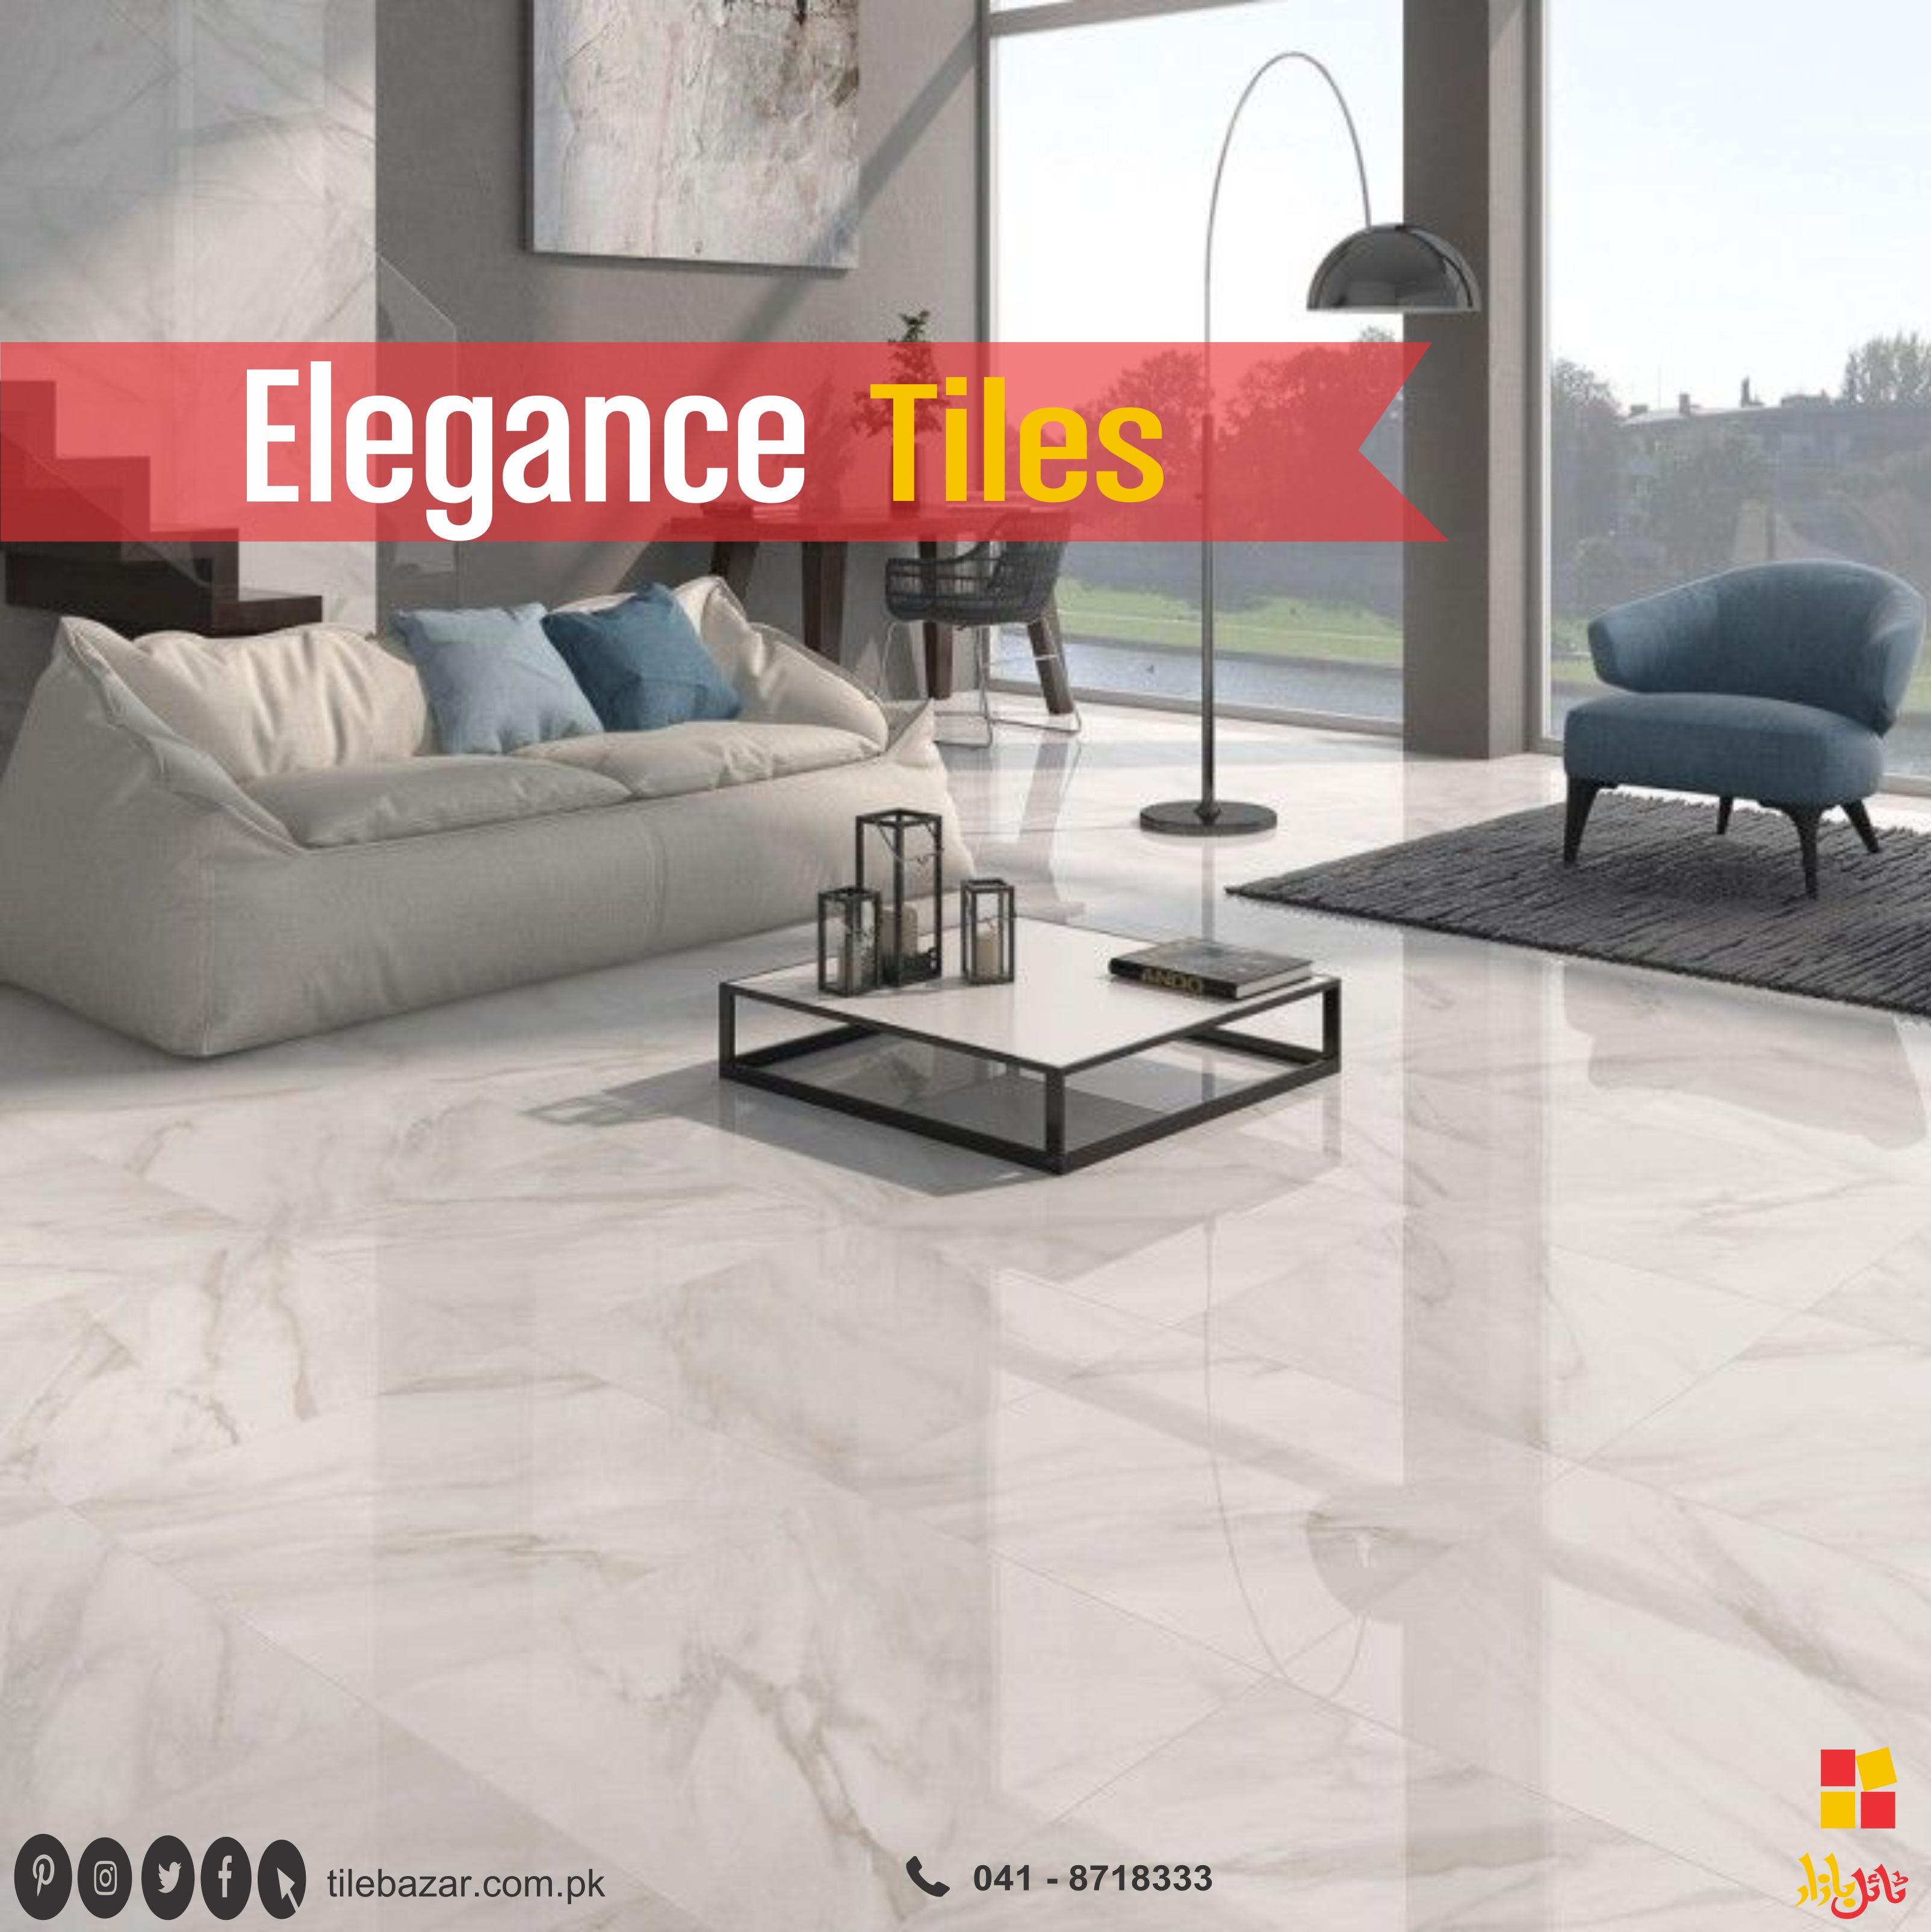 Elegant Tiles To Add Real Beauty To Your Living Room Eleganttiles Porcelaintile Homedecor Interior Livingroom Elegance Tiles Elegant Tiles Living Room